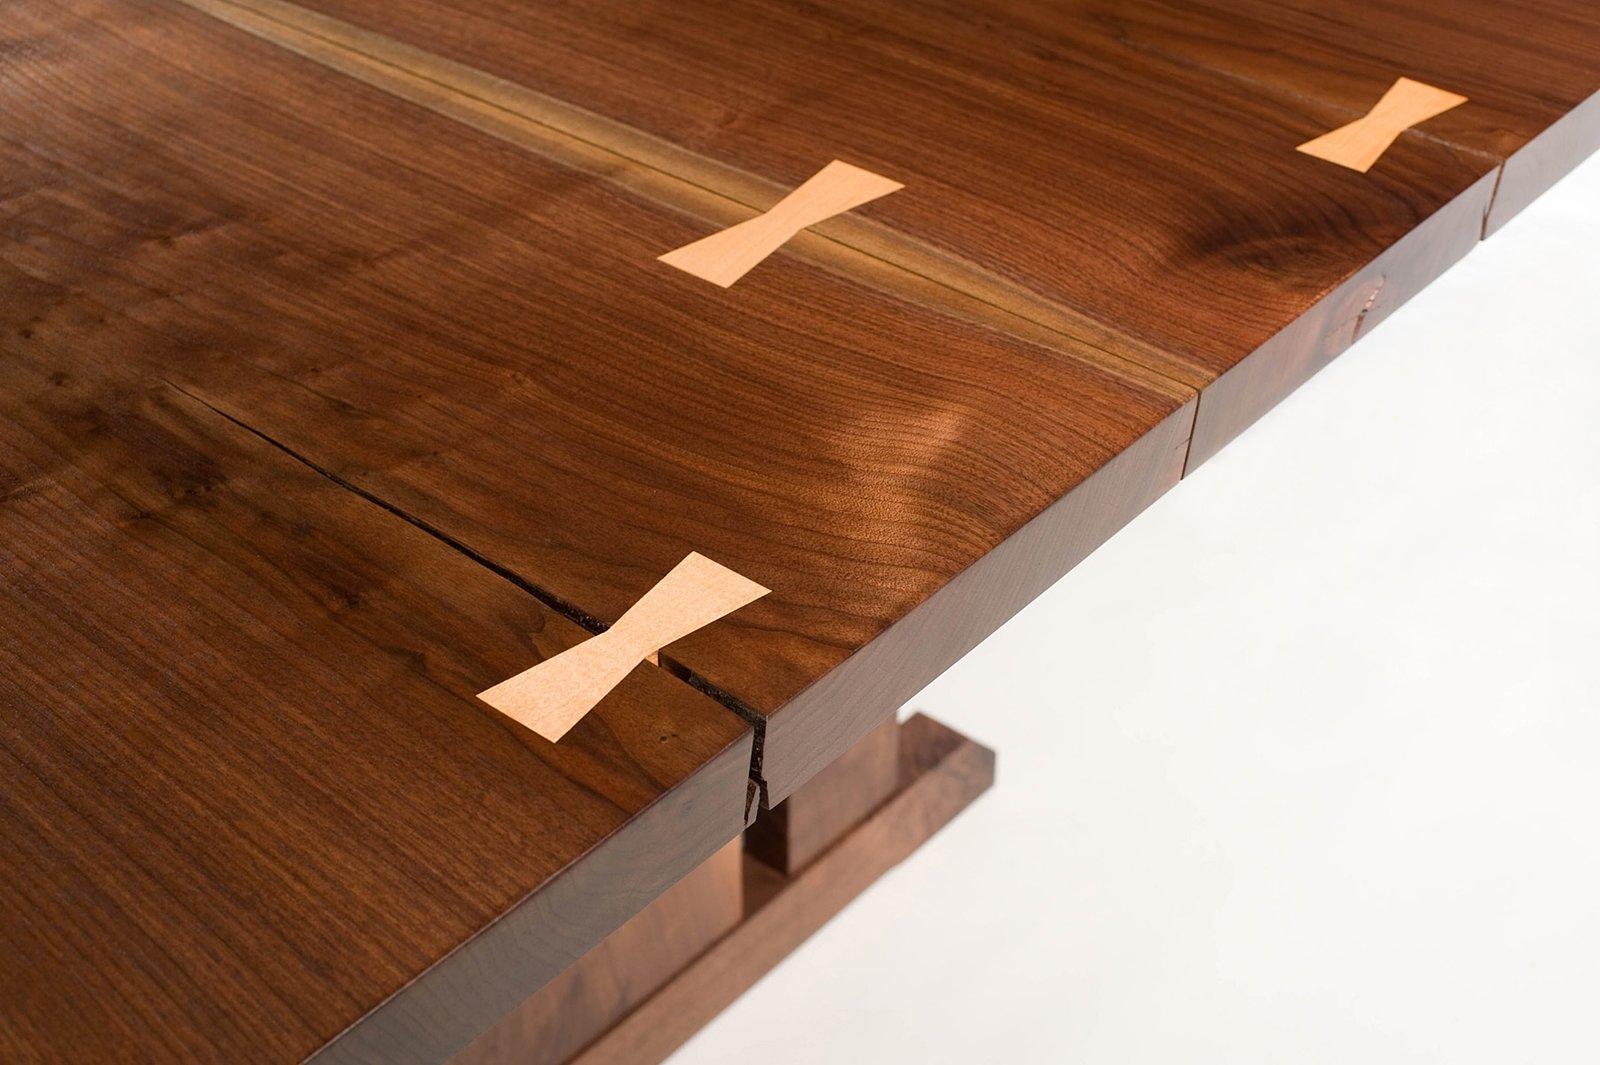 Maple dovetail keys  Tables by Joe Breznick